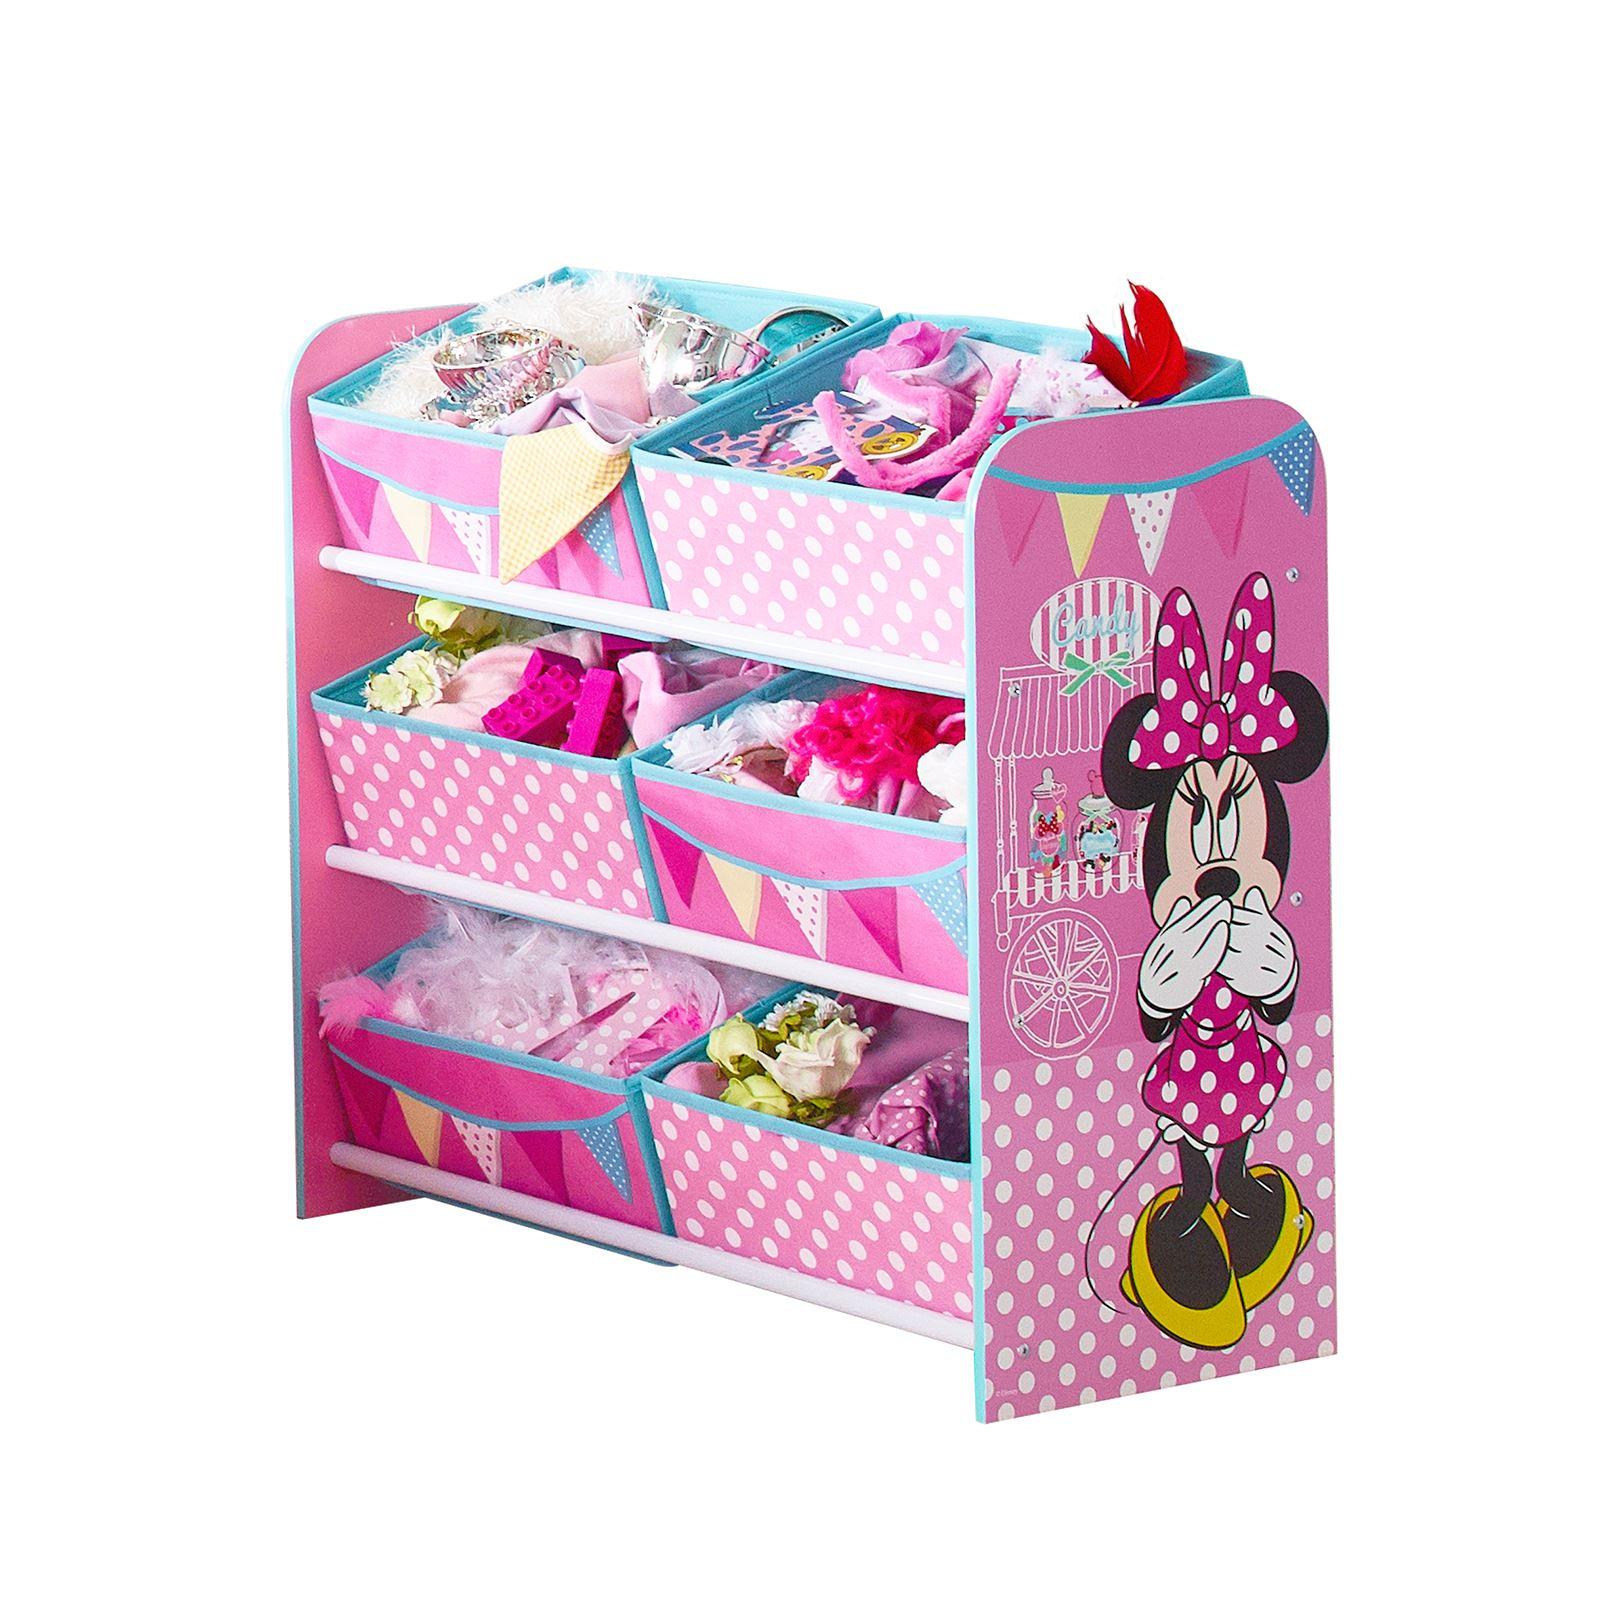 Gruffalo Bedroom Accessories